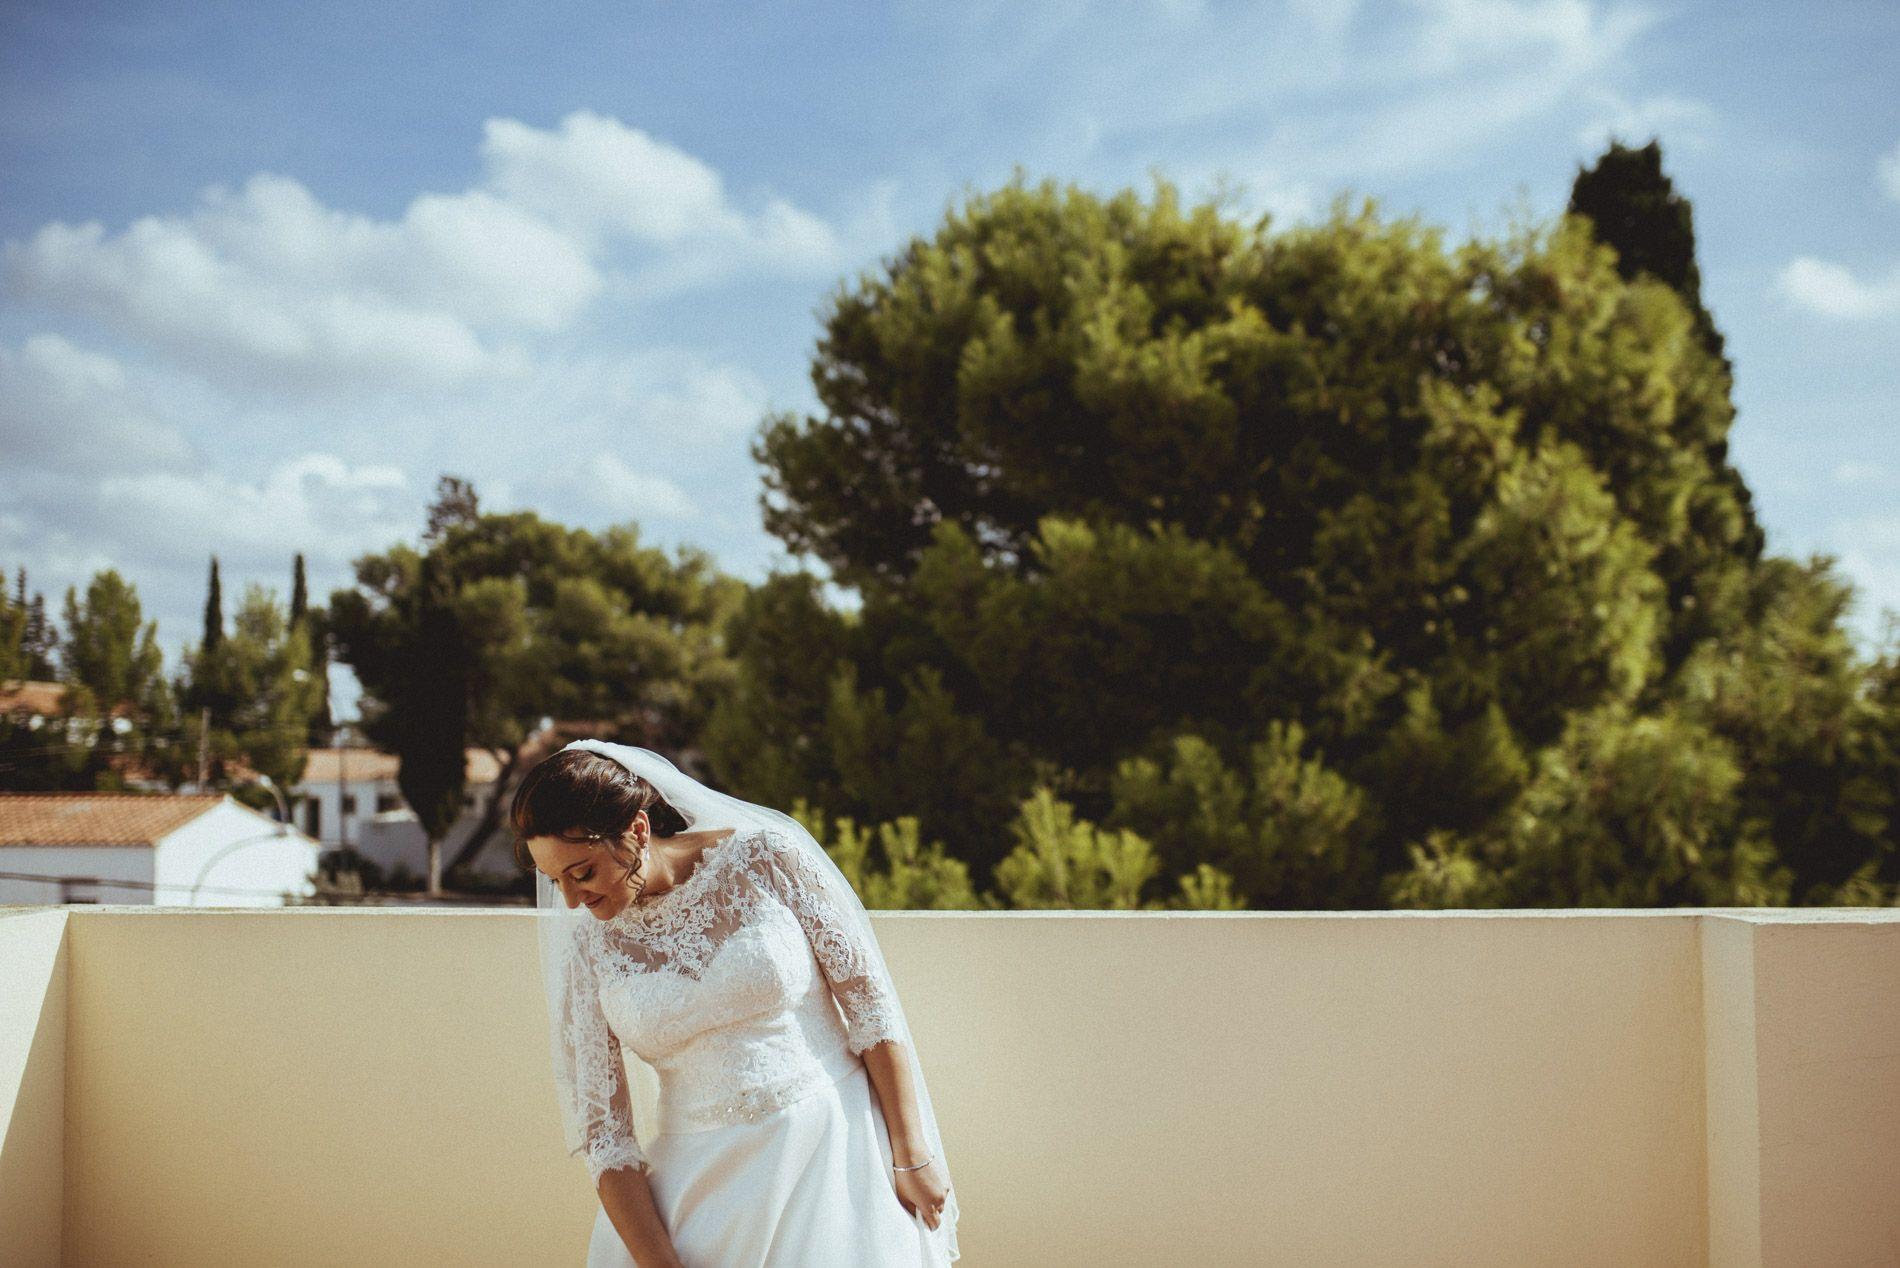 fotografia-boda-santi-miquel-bj-014